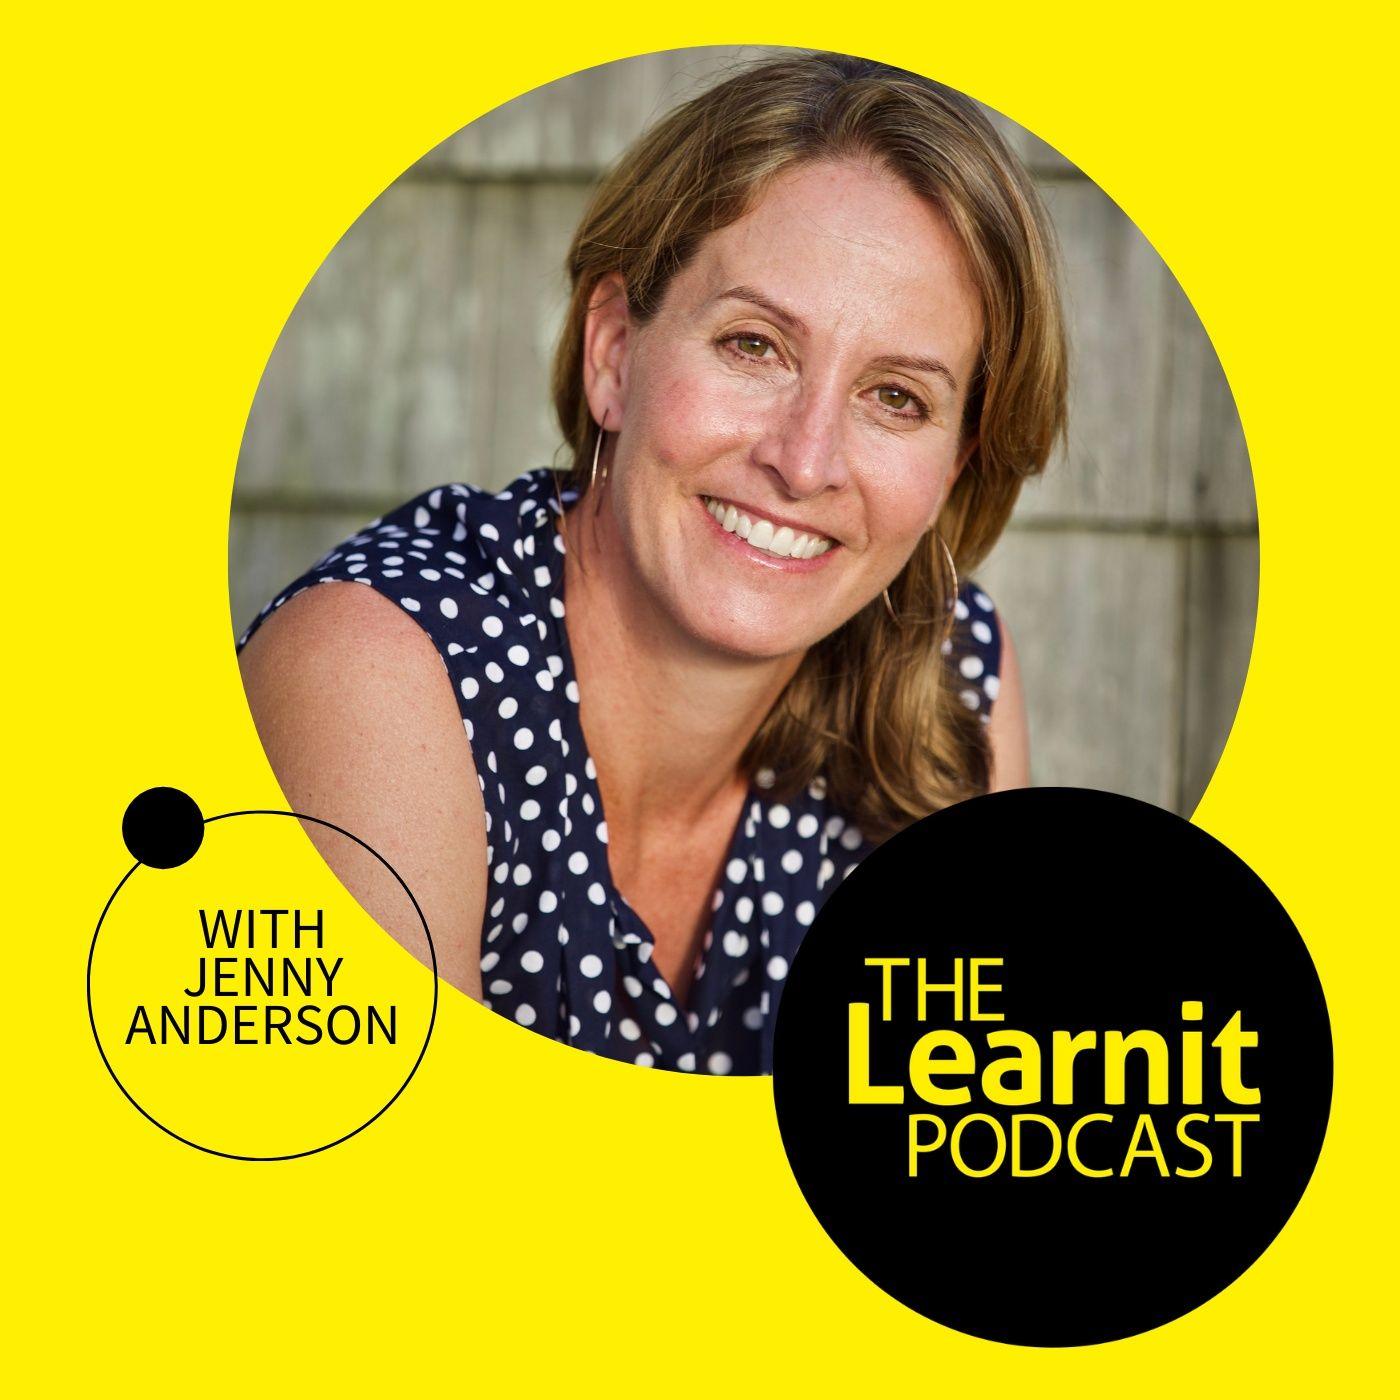 #7 Lisa Barrett, WhiteHat: Revolutionising apprenticeships to provide an equal alternative to university